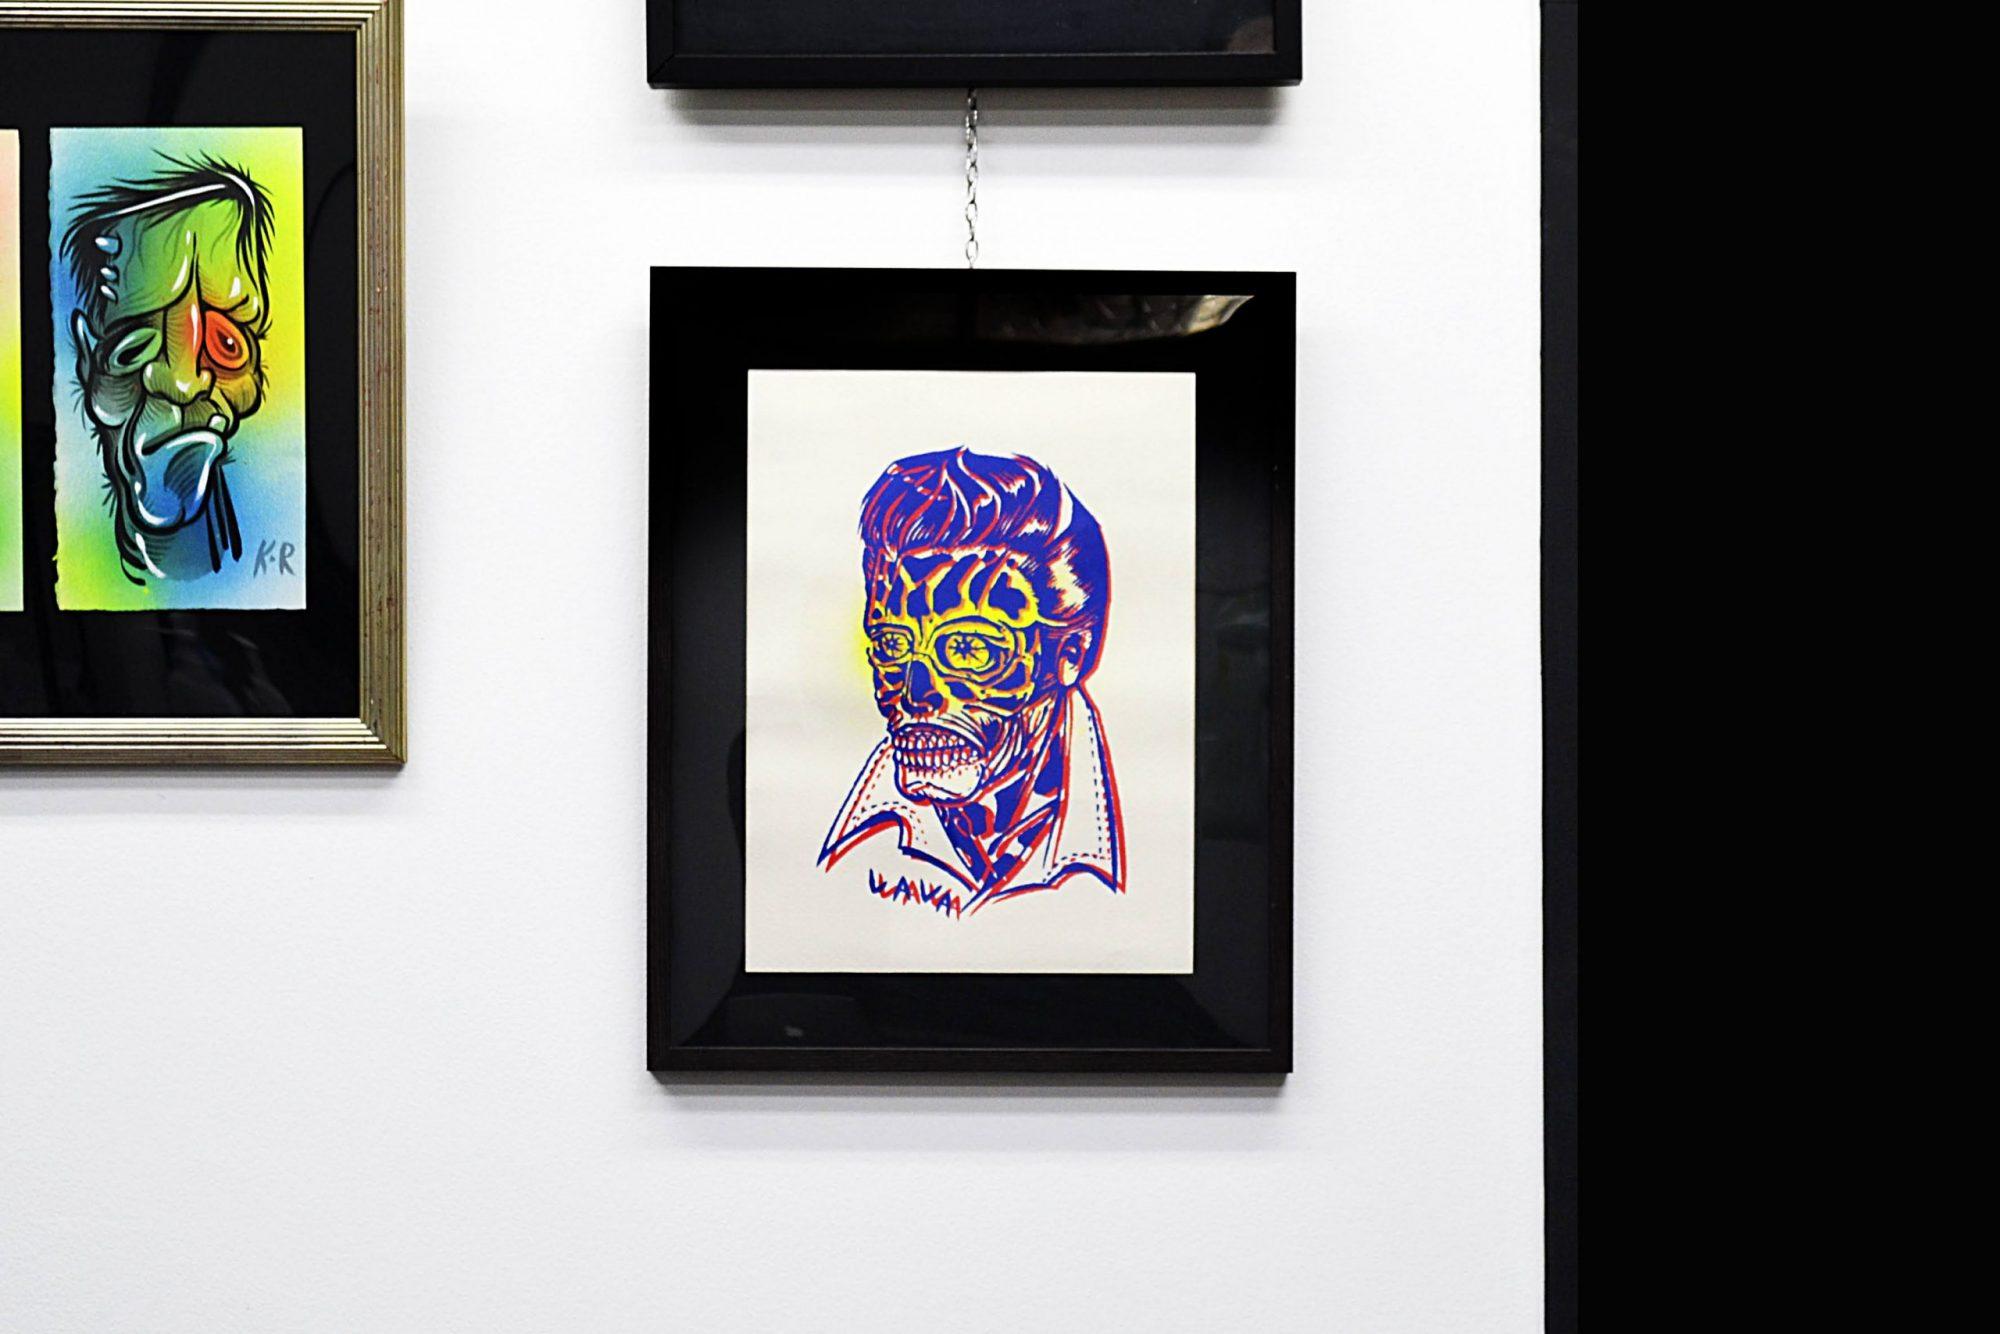 KINGRAT TATTOO 作品 | LAVA gallery | Tattoo artist: Yuji Anai | キングラット | ラバギャラリー | タトゥーアート | 福岡県北九州市 | 0061_scaled作品